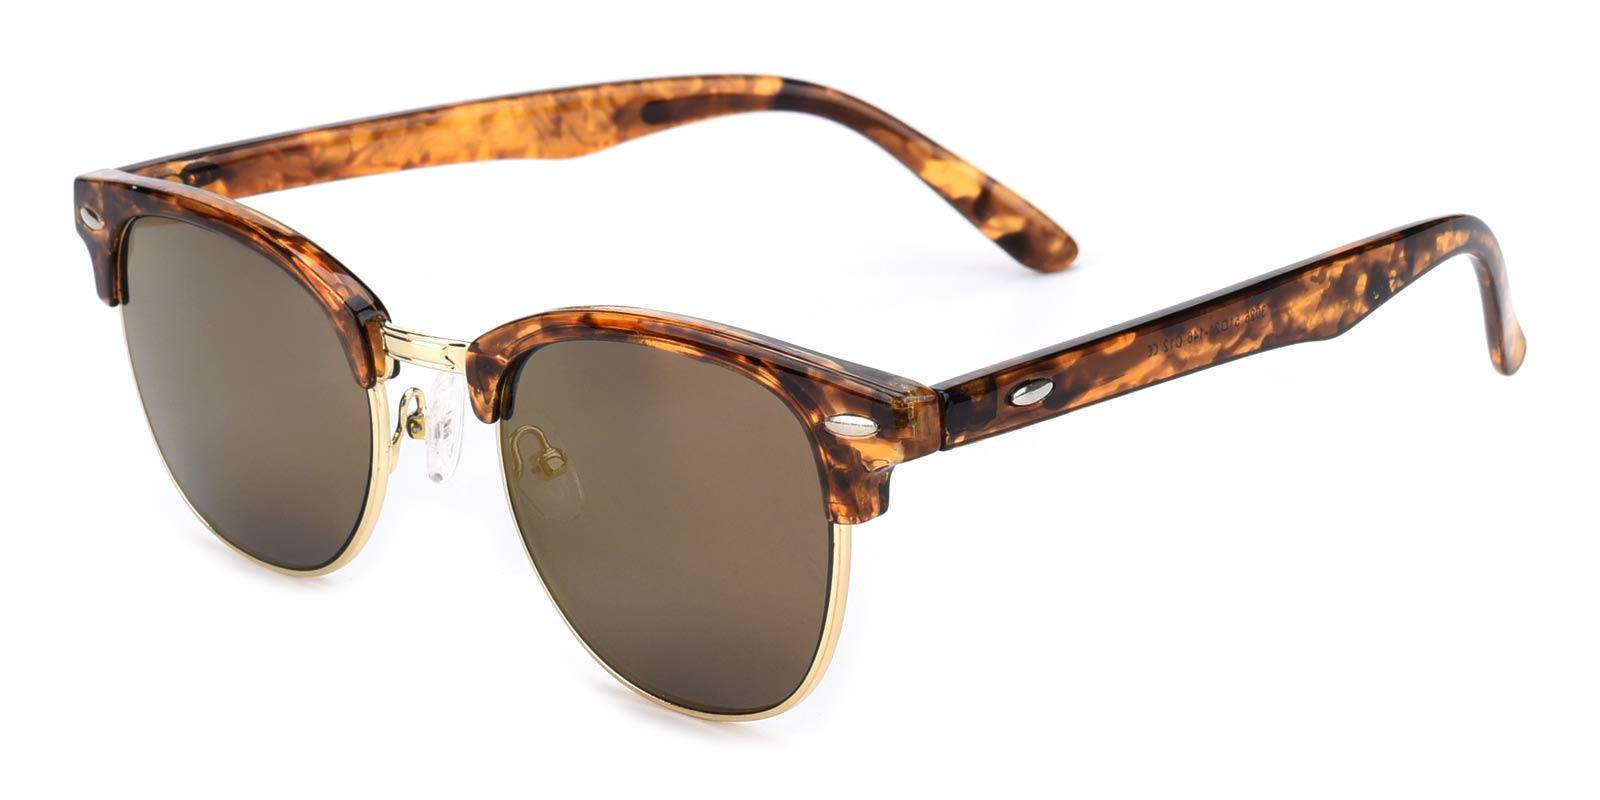 Simon-Tortoise-Browline-TR-Sunglasses-detail